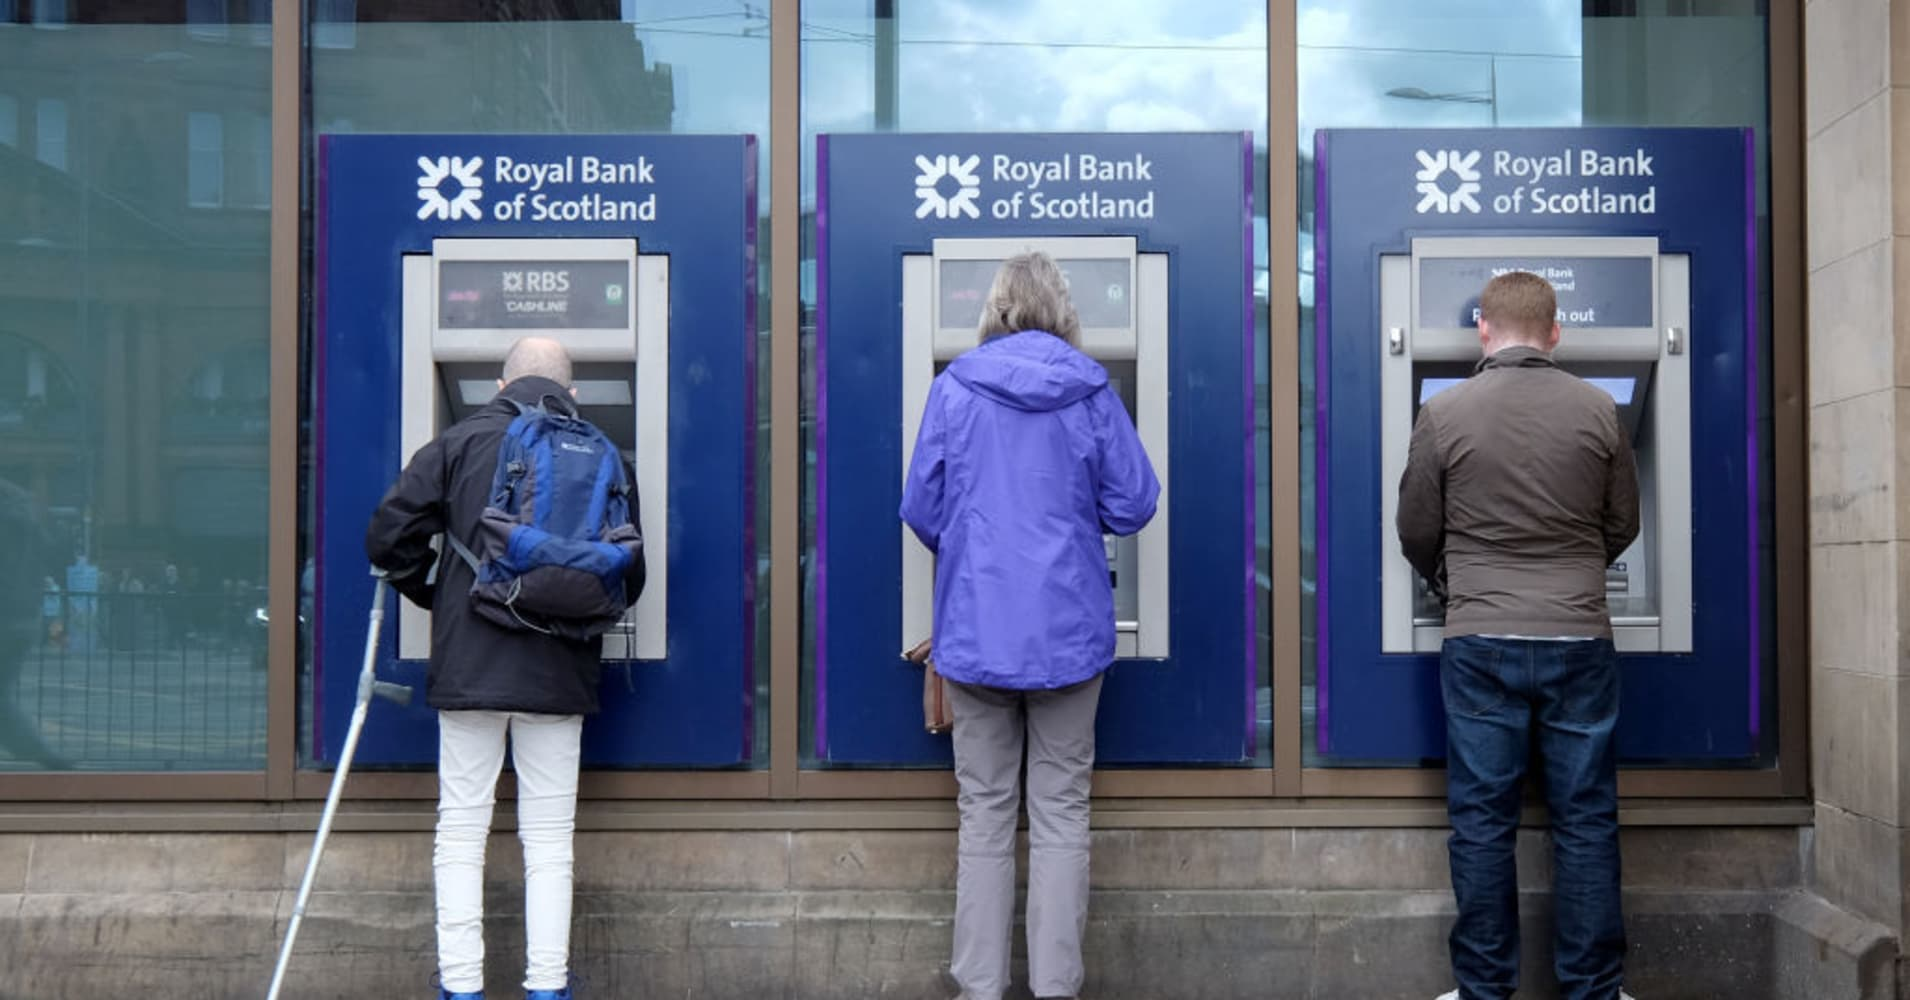 British taxpayer set to lose billions in $3.5 billion RBS sale